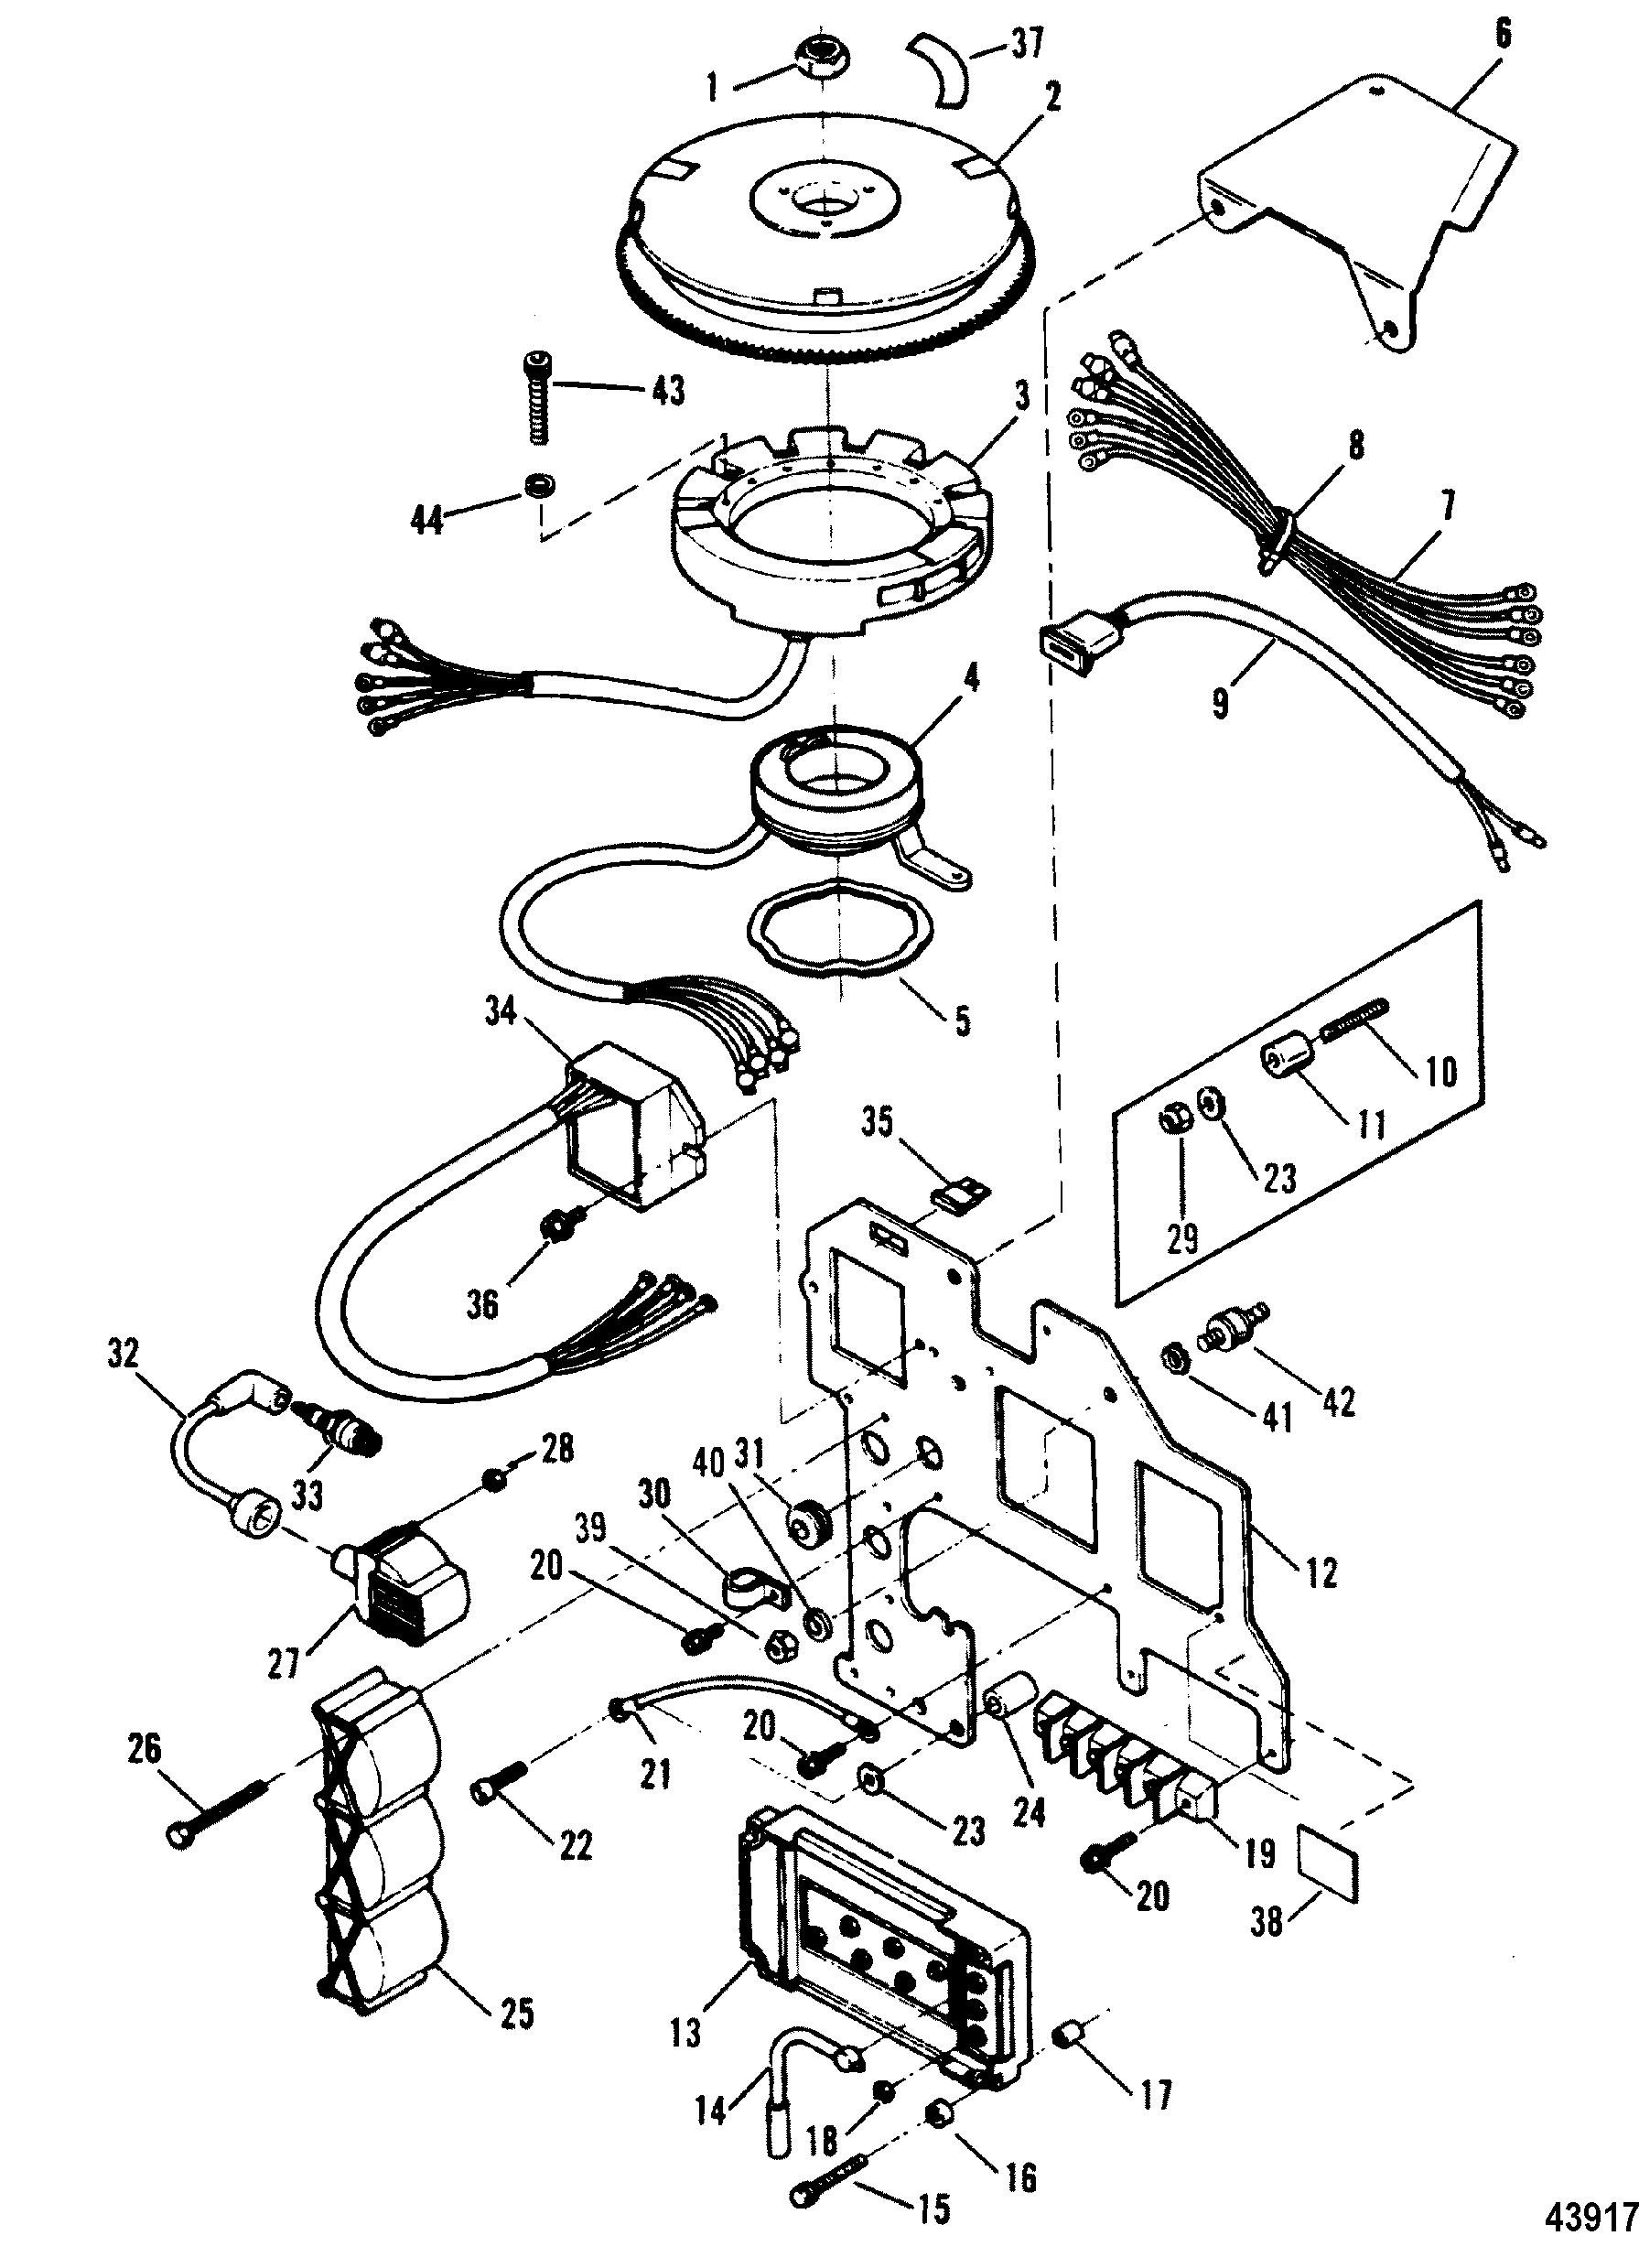 Каталог запчастей force 90 h p (1991 1992) 1991e thru 1992cignition components(91h thru 92c)